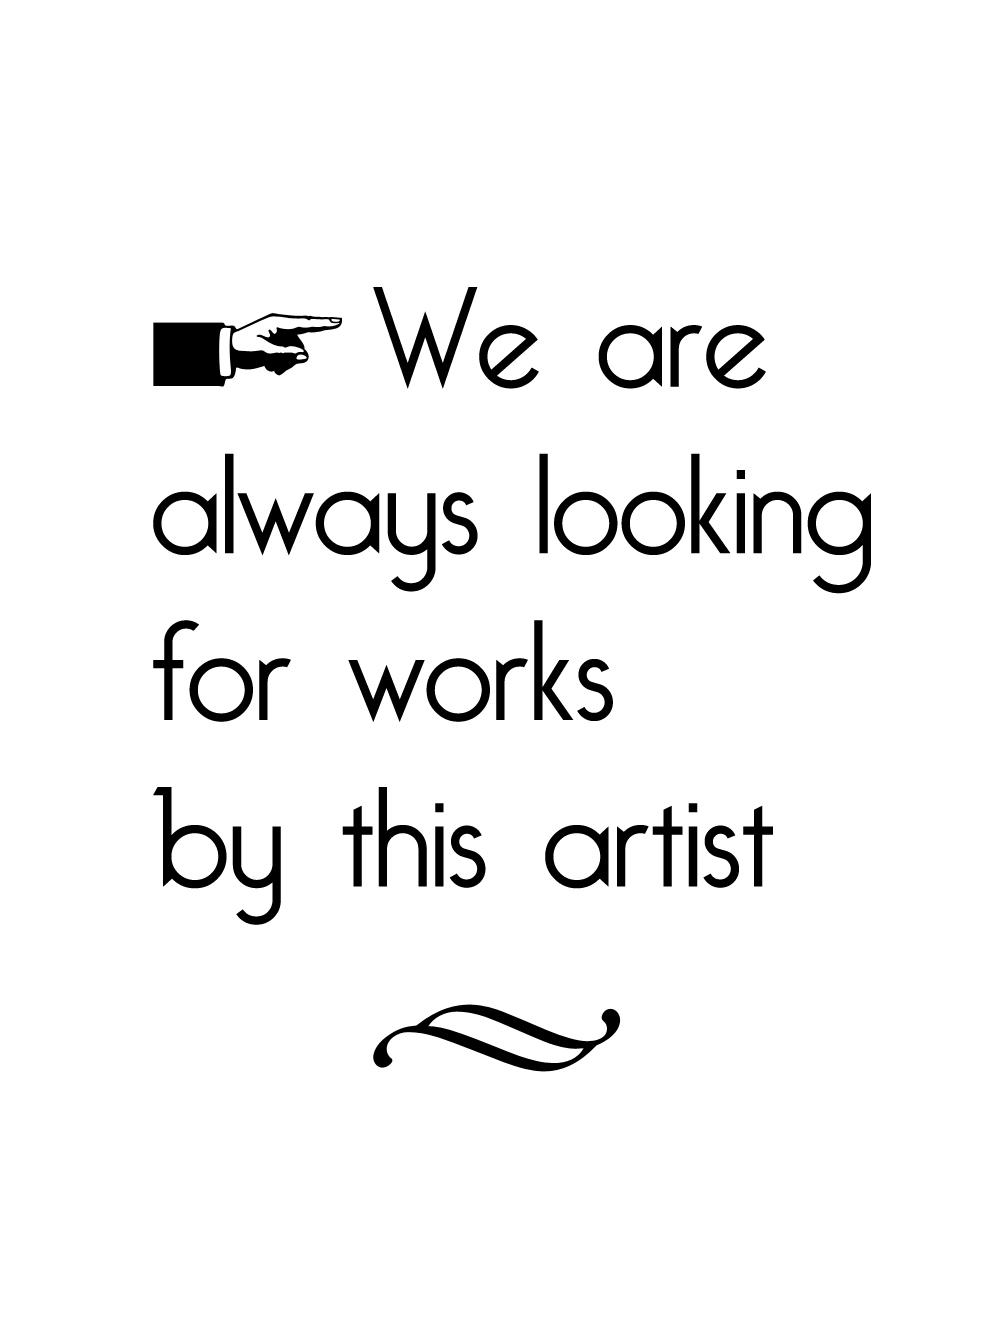 aa Seeking-Works-image